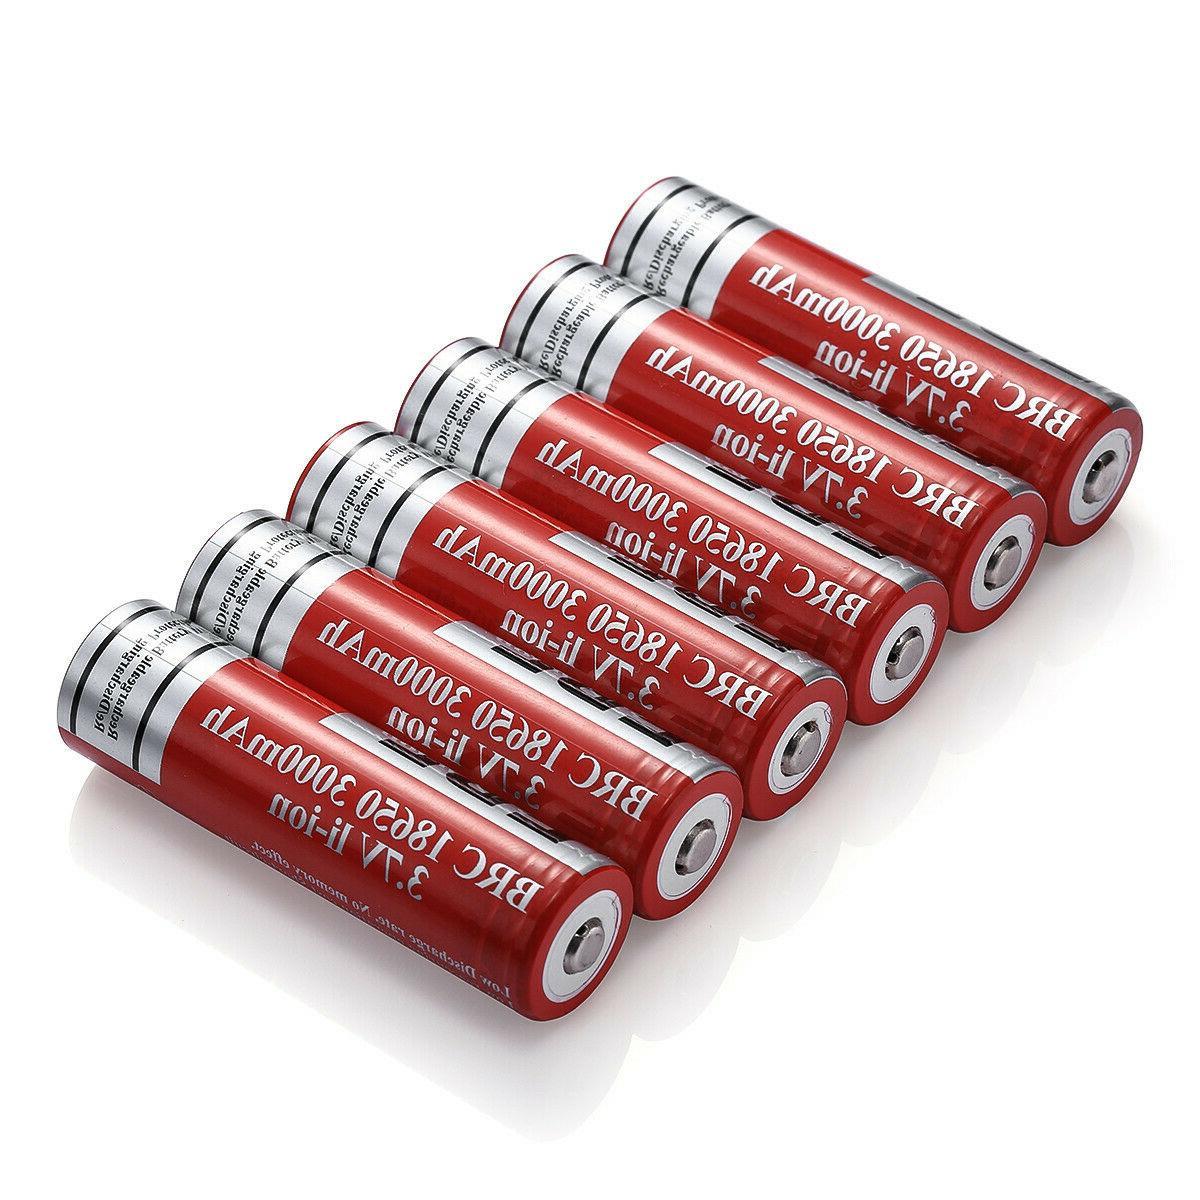 EBL 18650 3000mAh 3.7V Rechargeable For